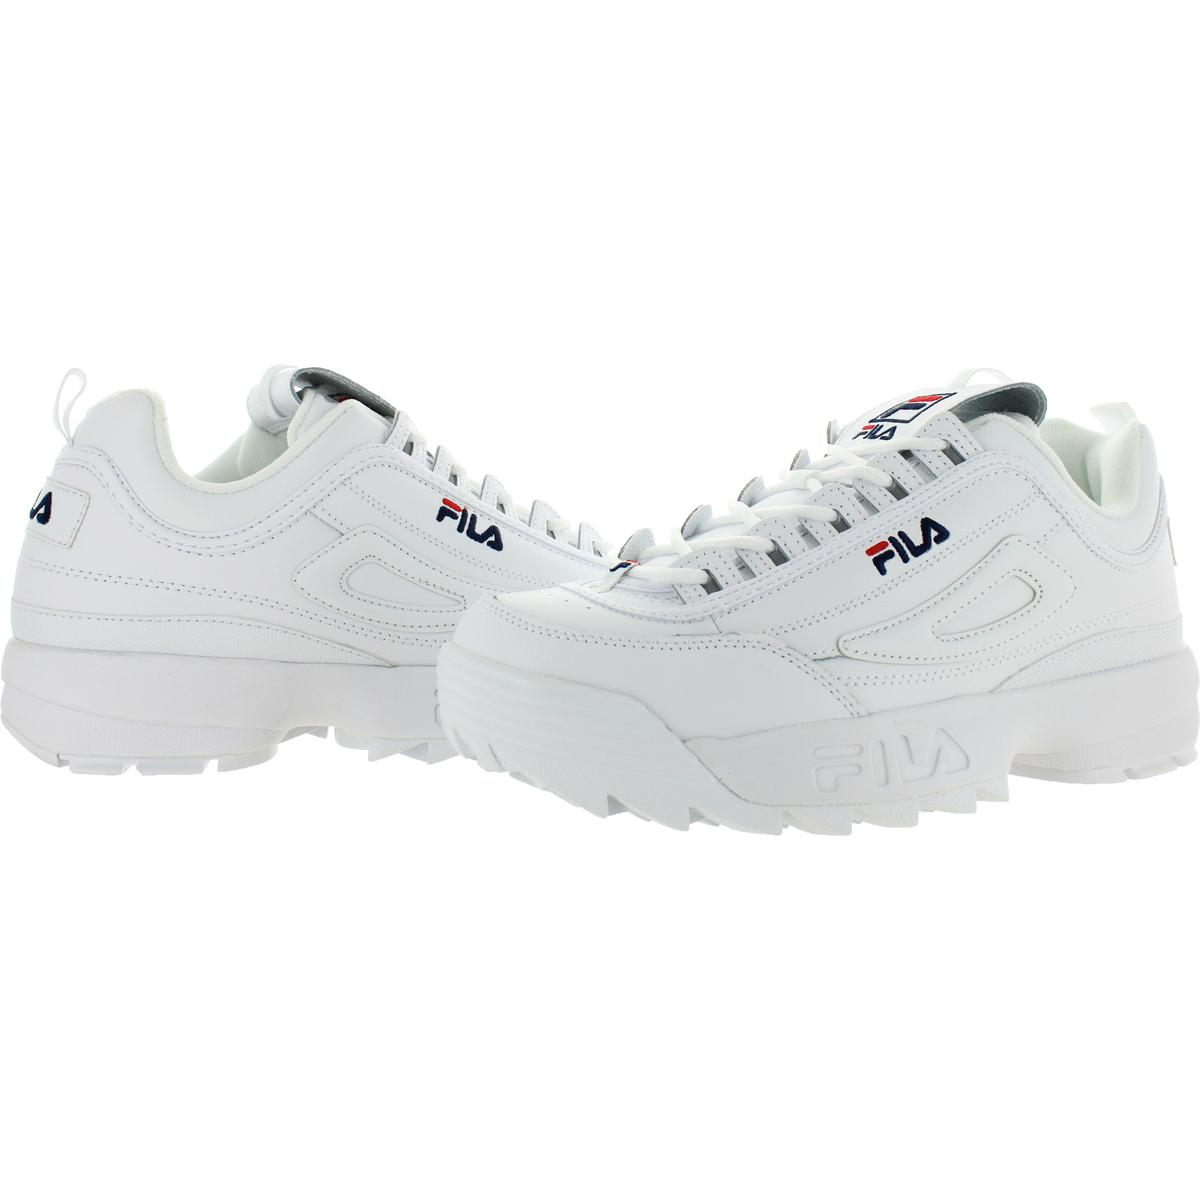 thumbnail 5 - Fila Men's Disruptor II Premium Leather EVA Retro Chunky Athletic Sneakers